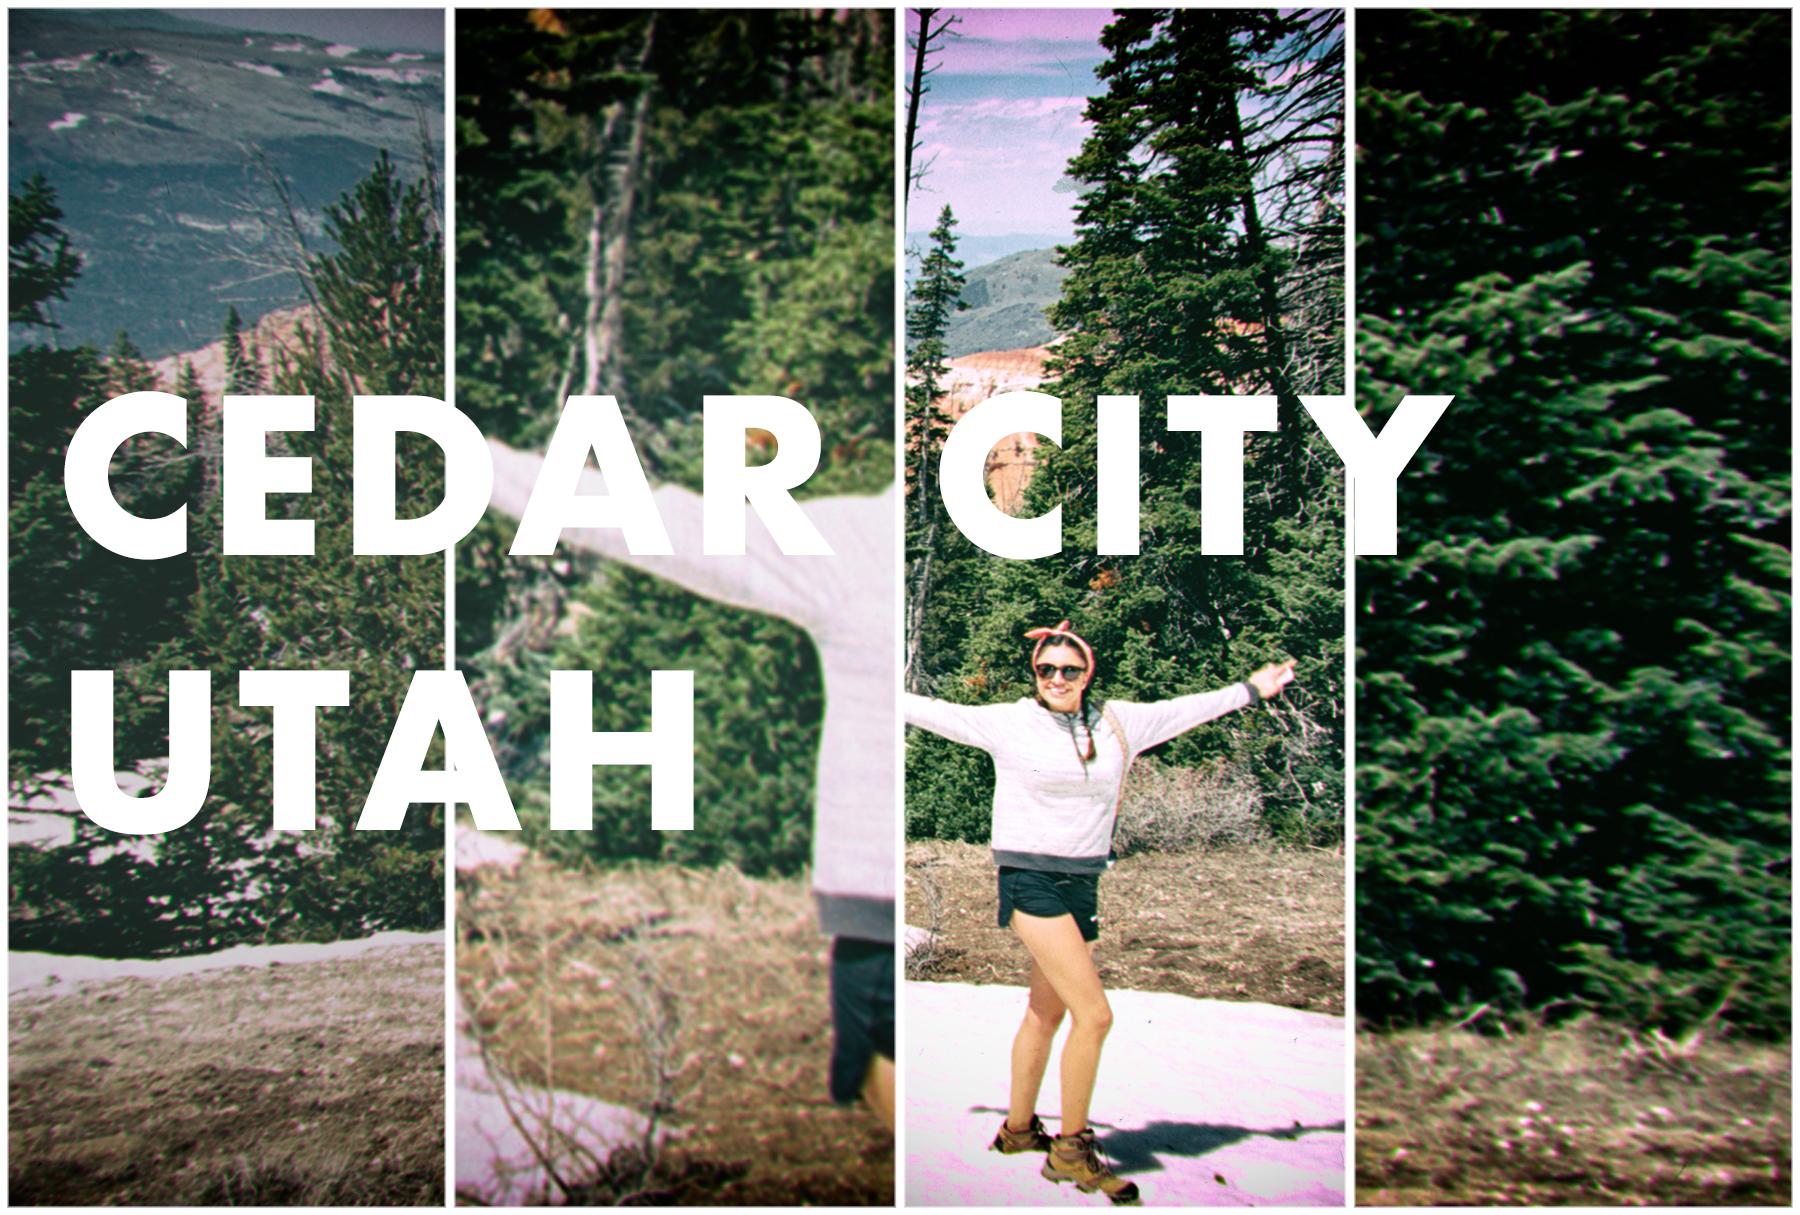 CedarCity_Headder